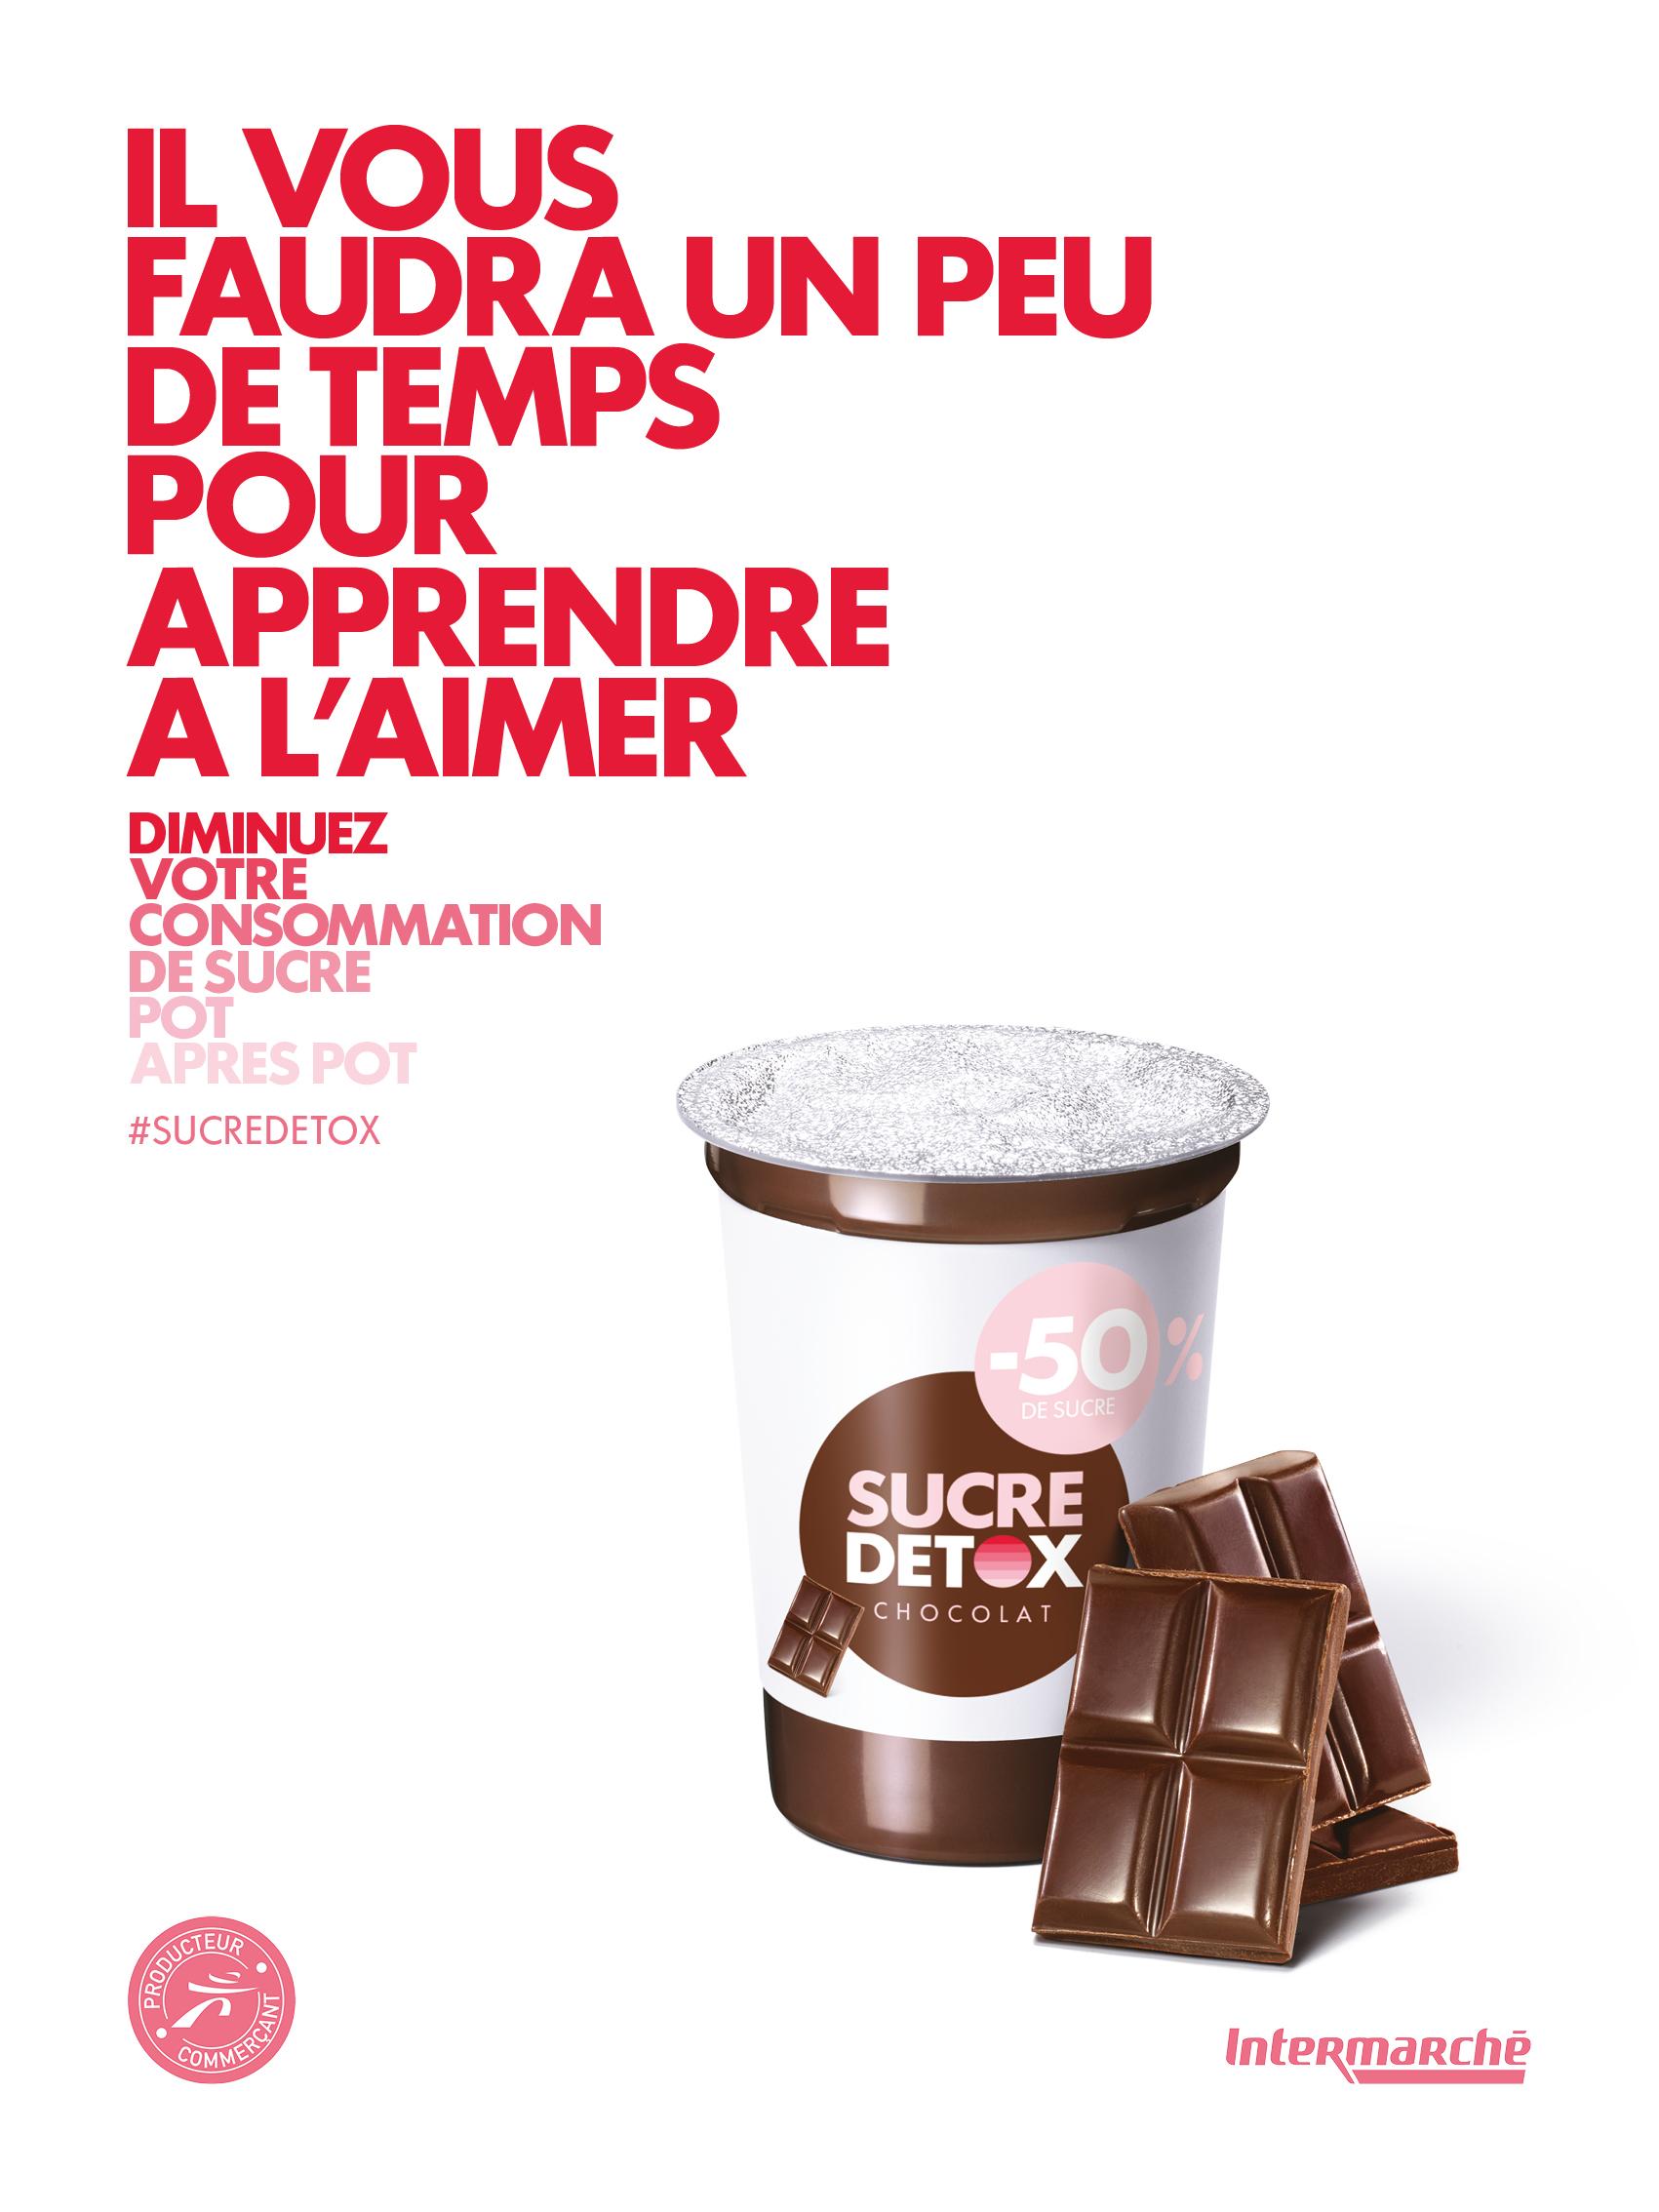 intermarche-sucre-detox-creme-dessert-pourcentage-sucre-semaine-agence-marcel-2